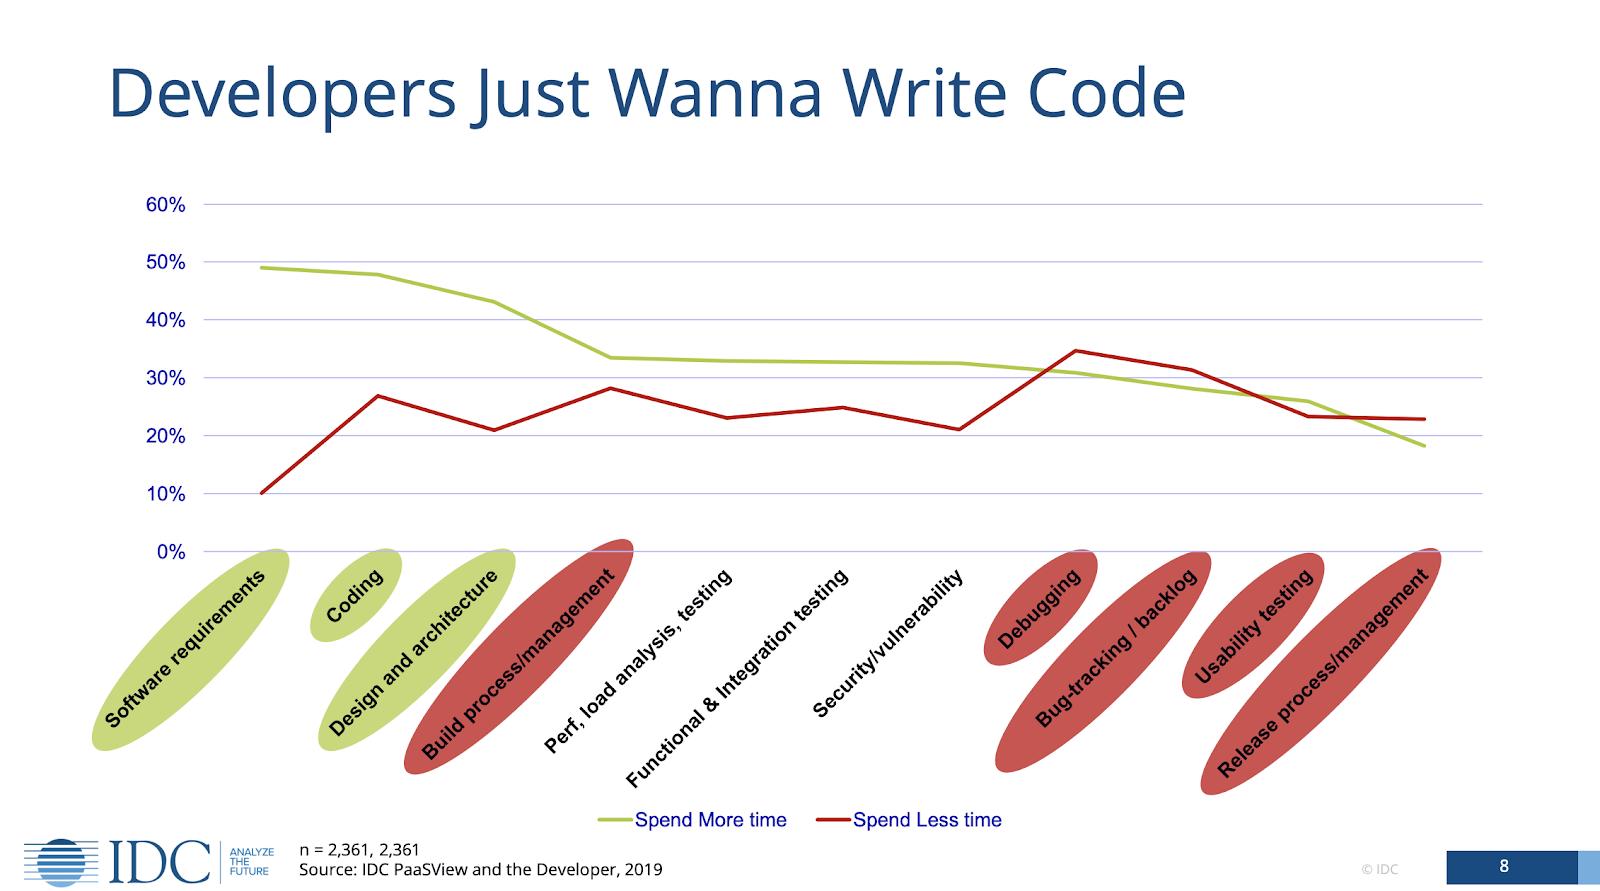 developers-just-wanna-write-code